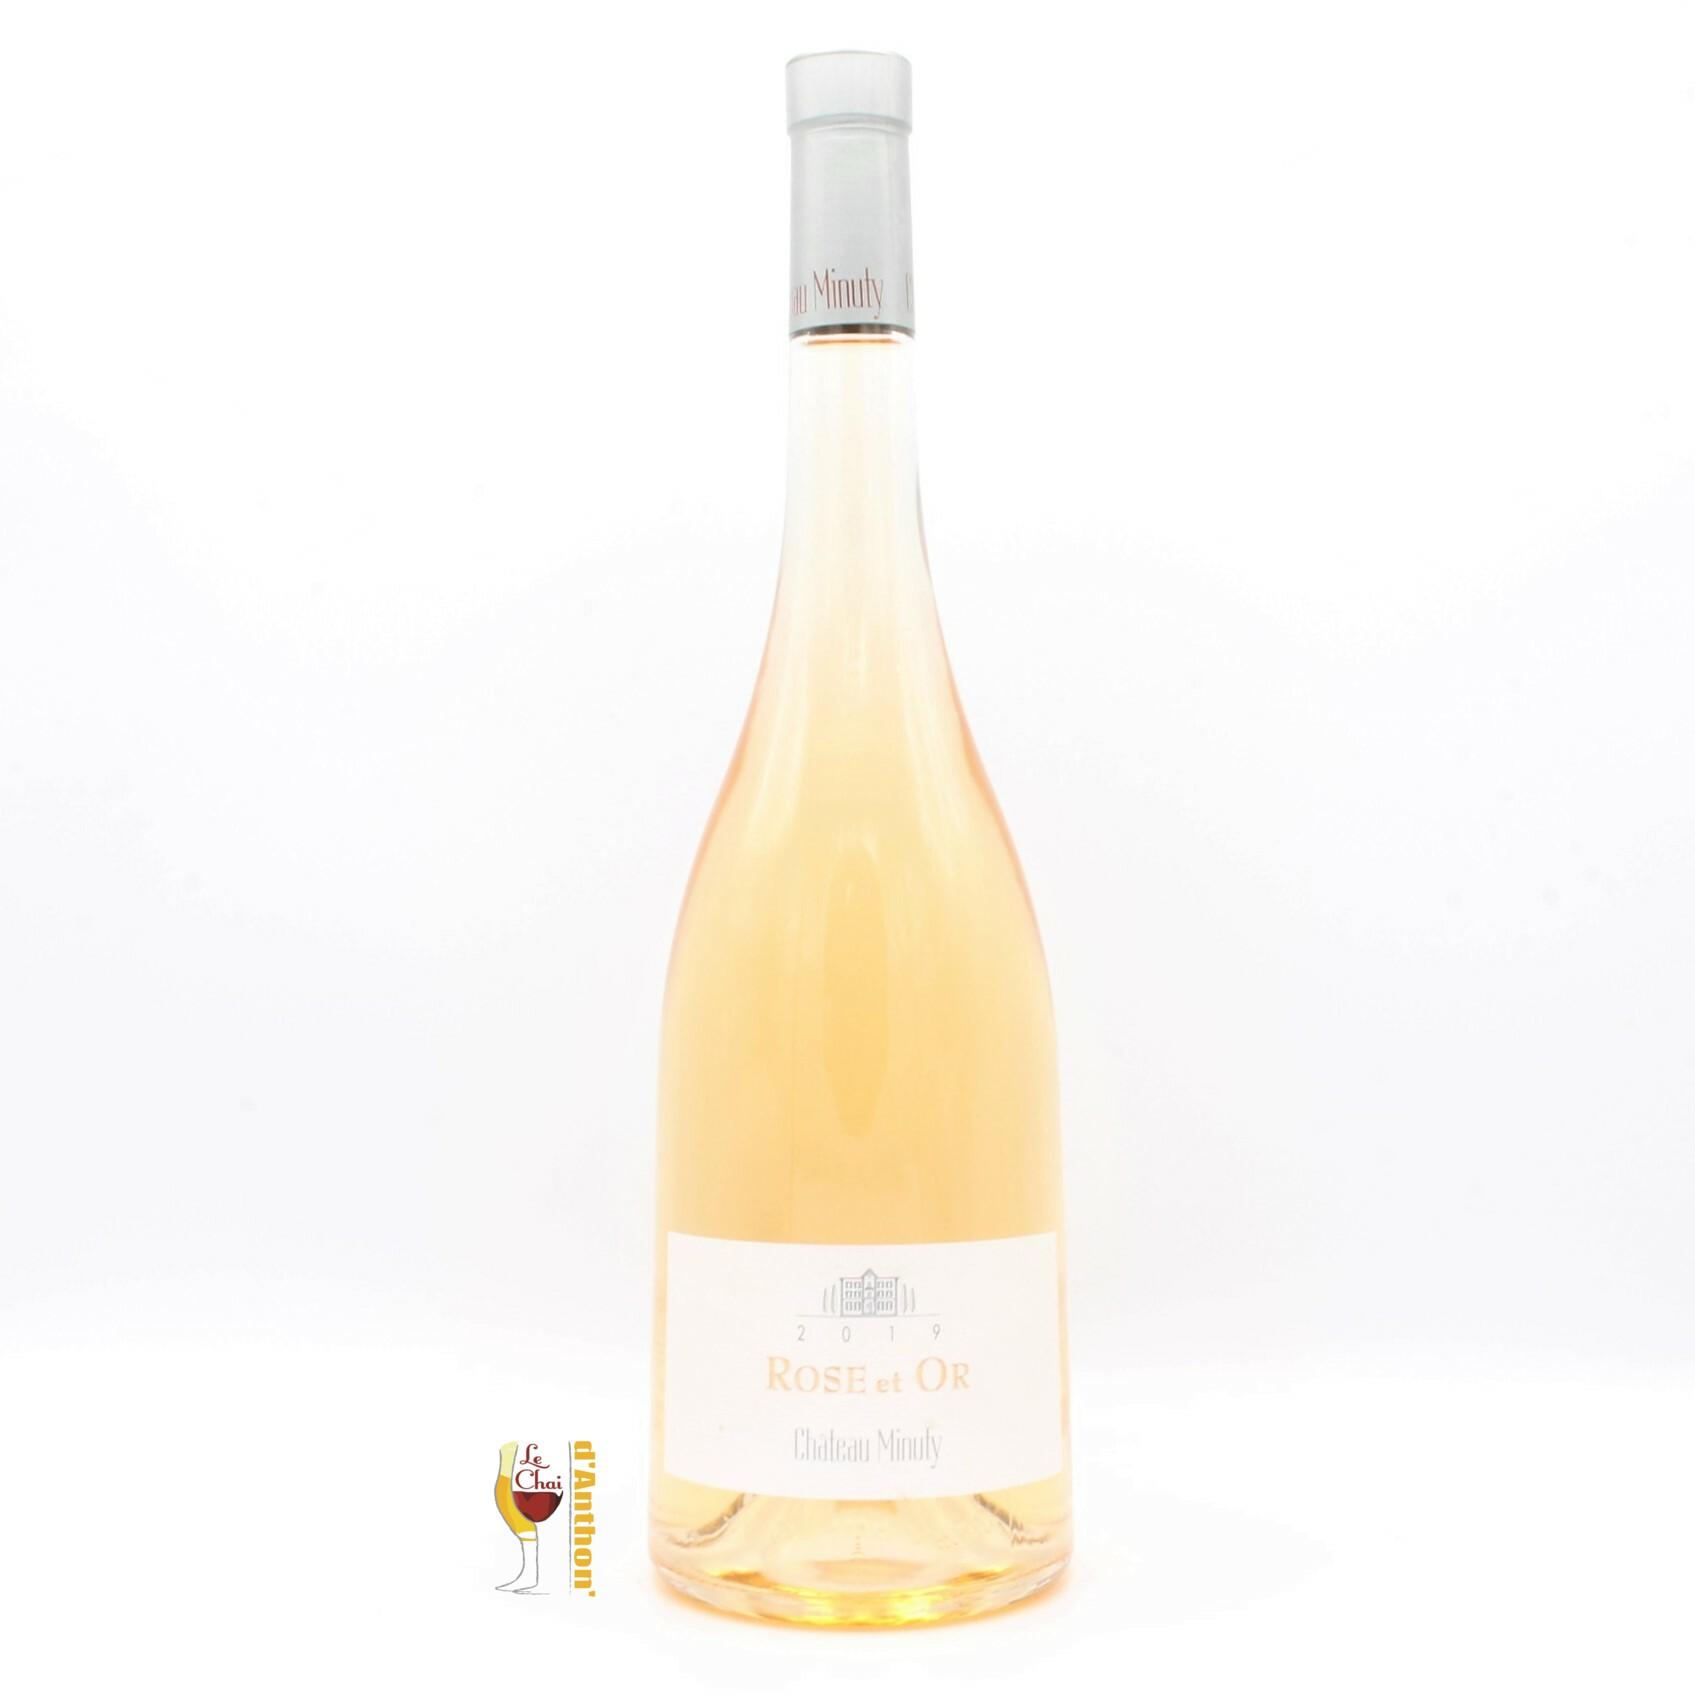 Vin Magnum Grand Format Rose Provence Or Minuty 150cl